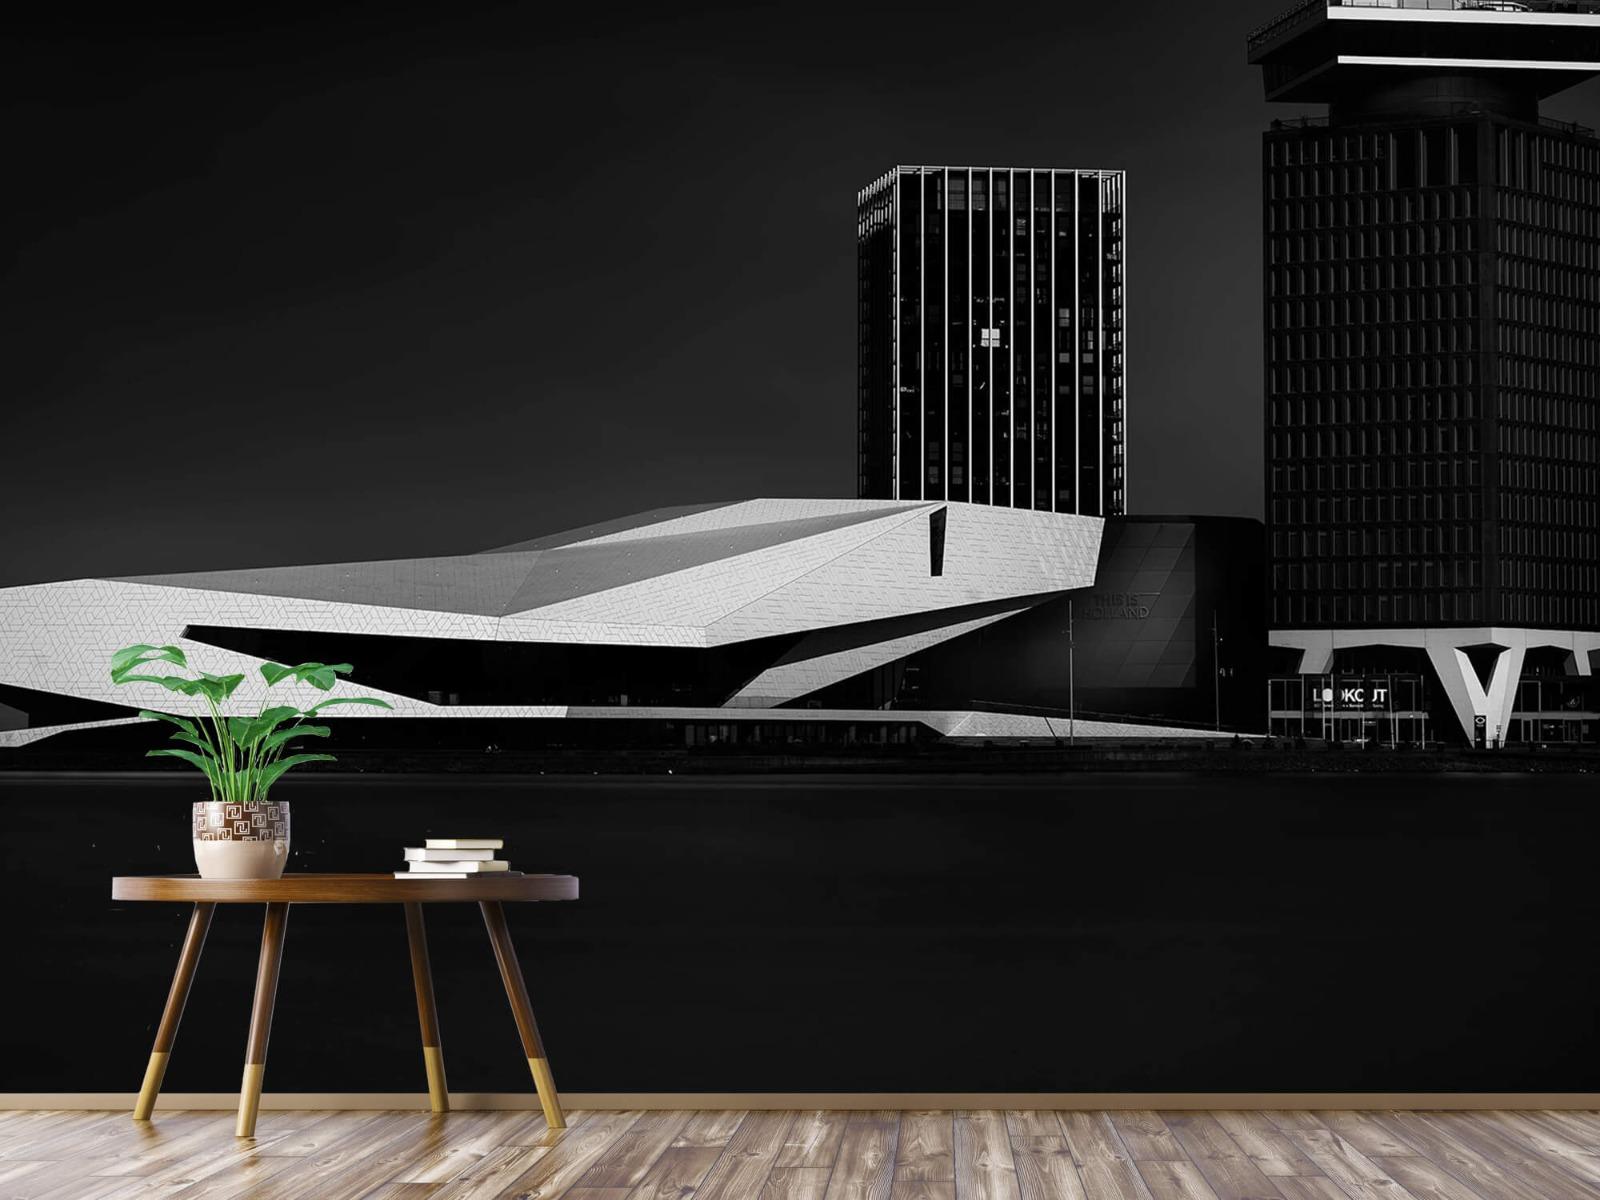 Modern behang - Gebouwen Amsterdam - Tienerkamer 4